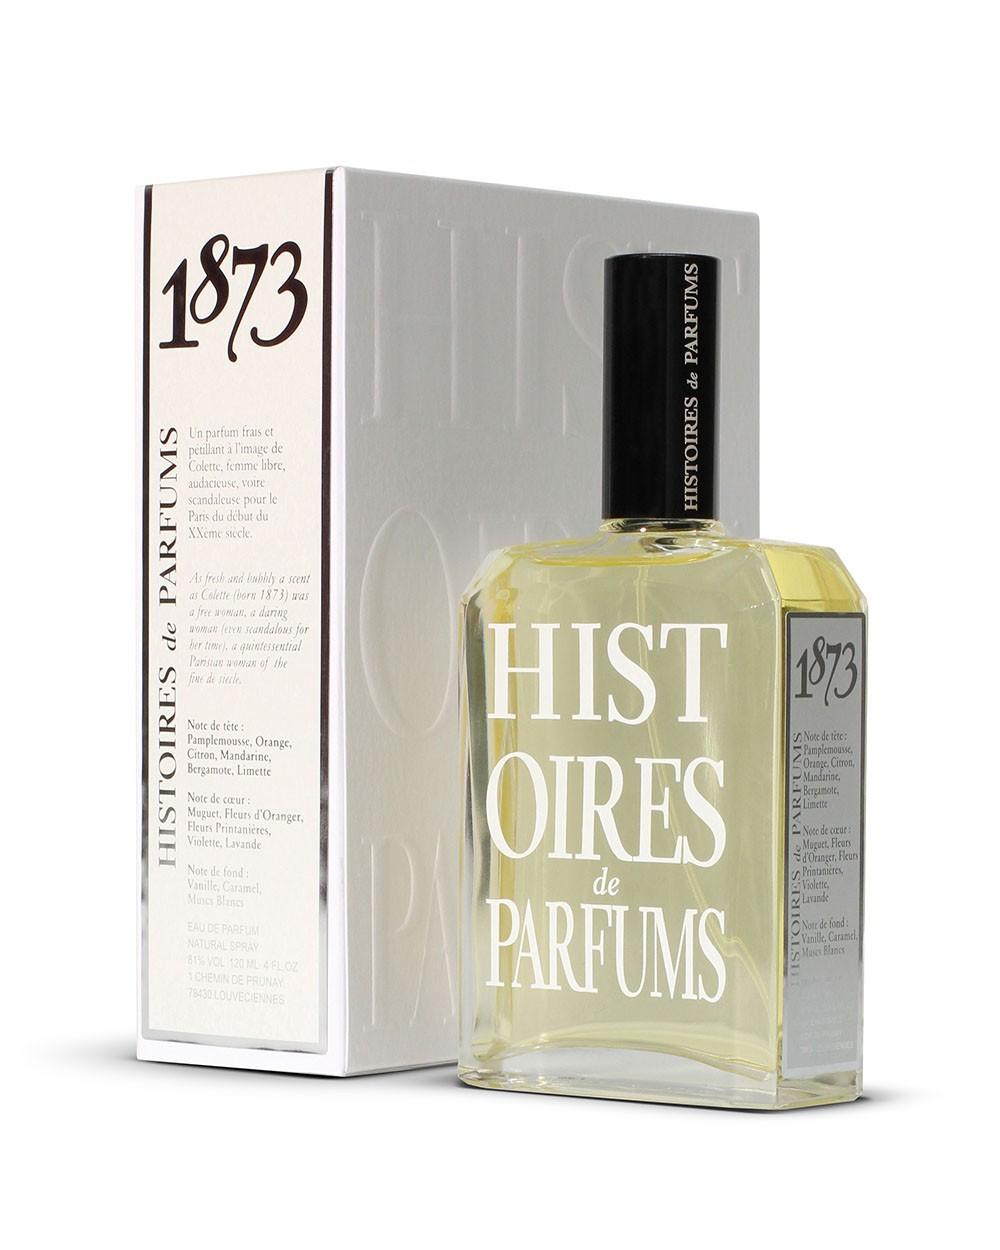 Histoires de Parfums 1873 Colette аромат для женщин